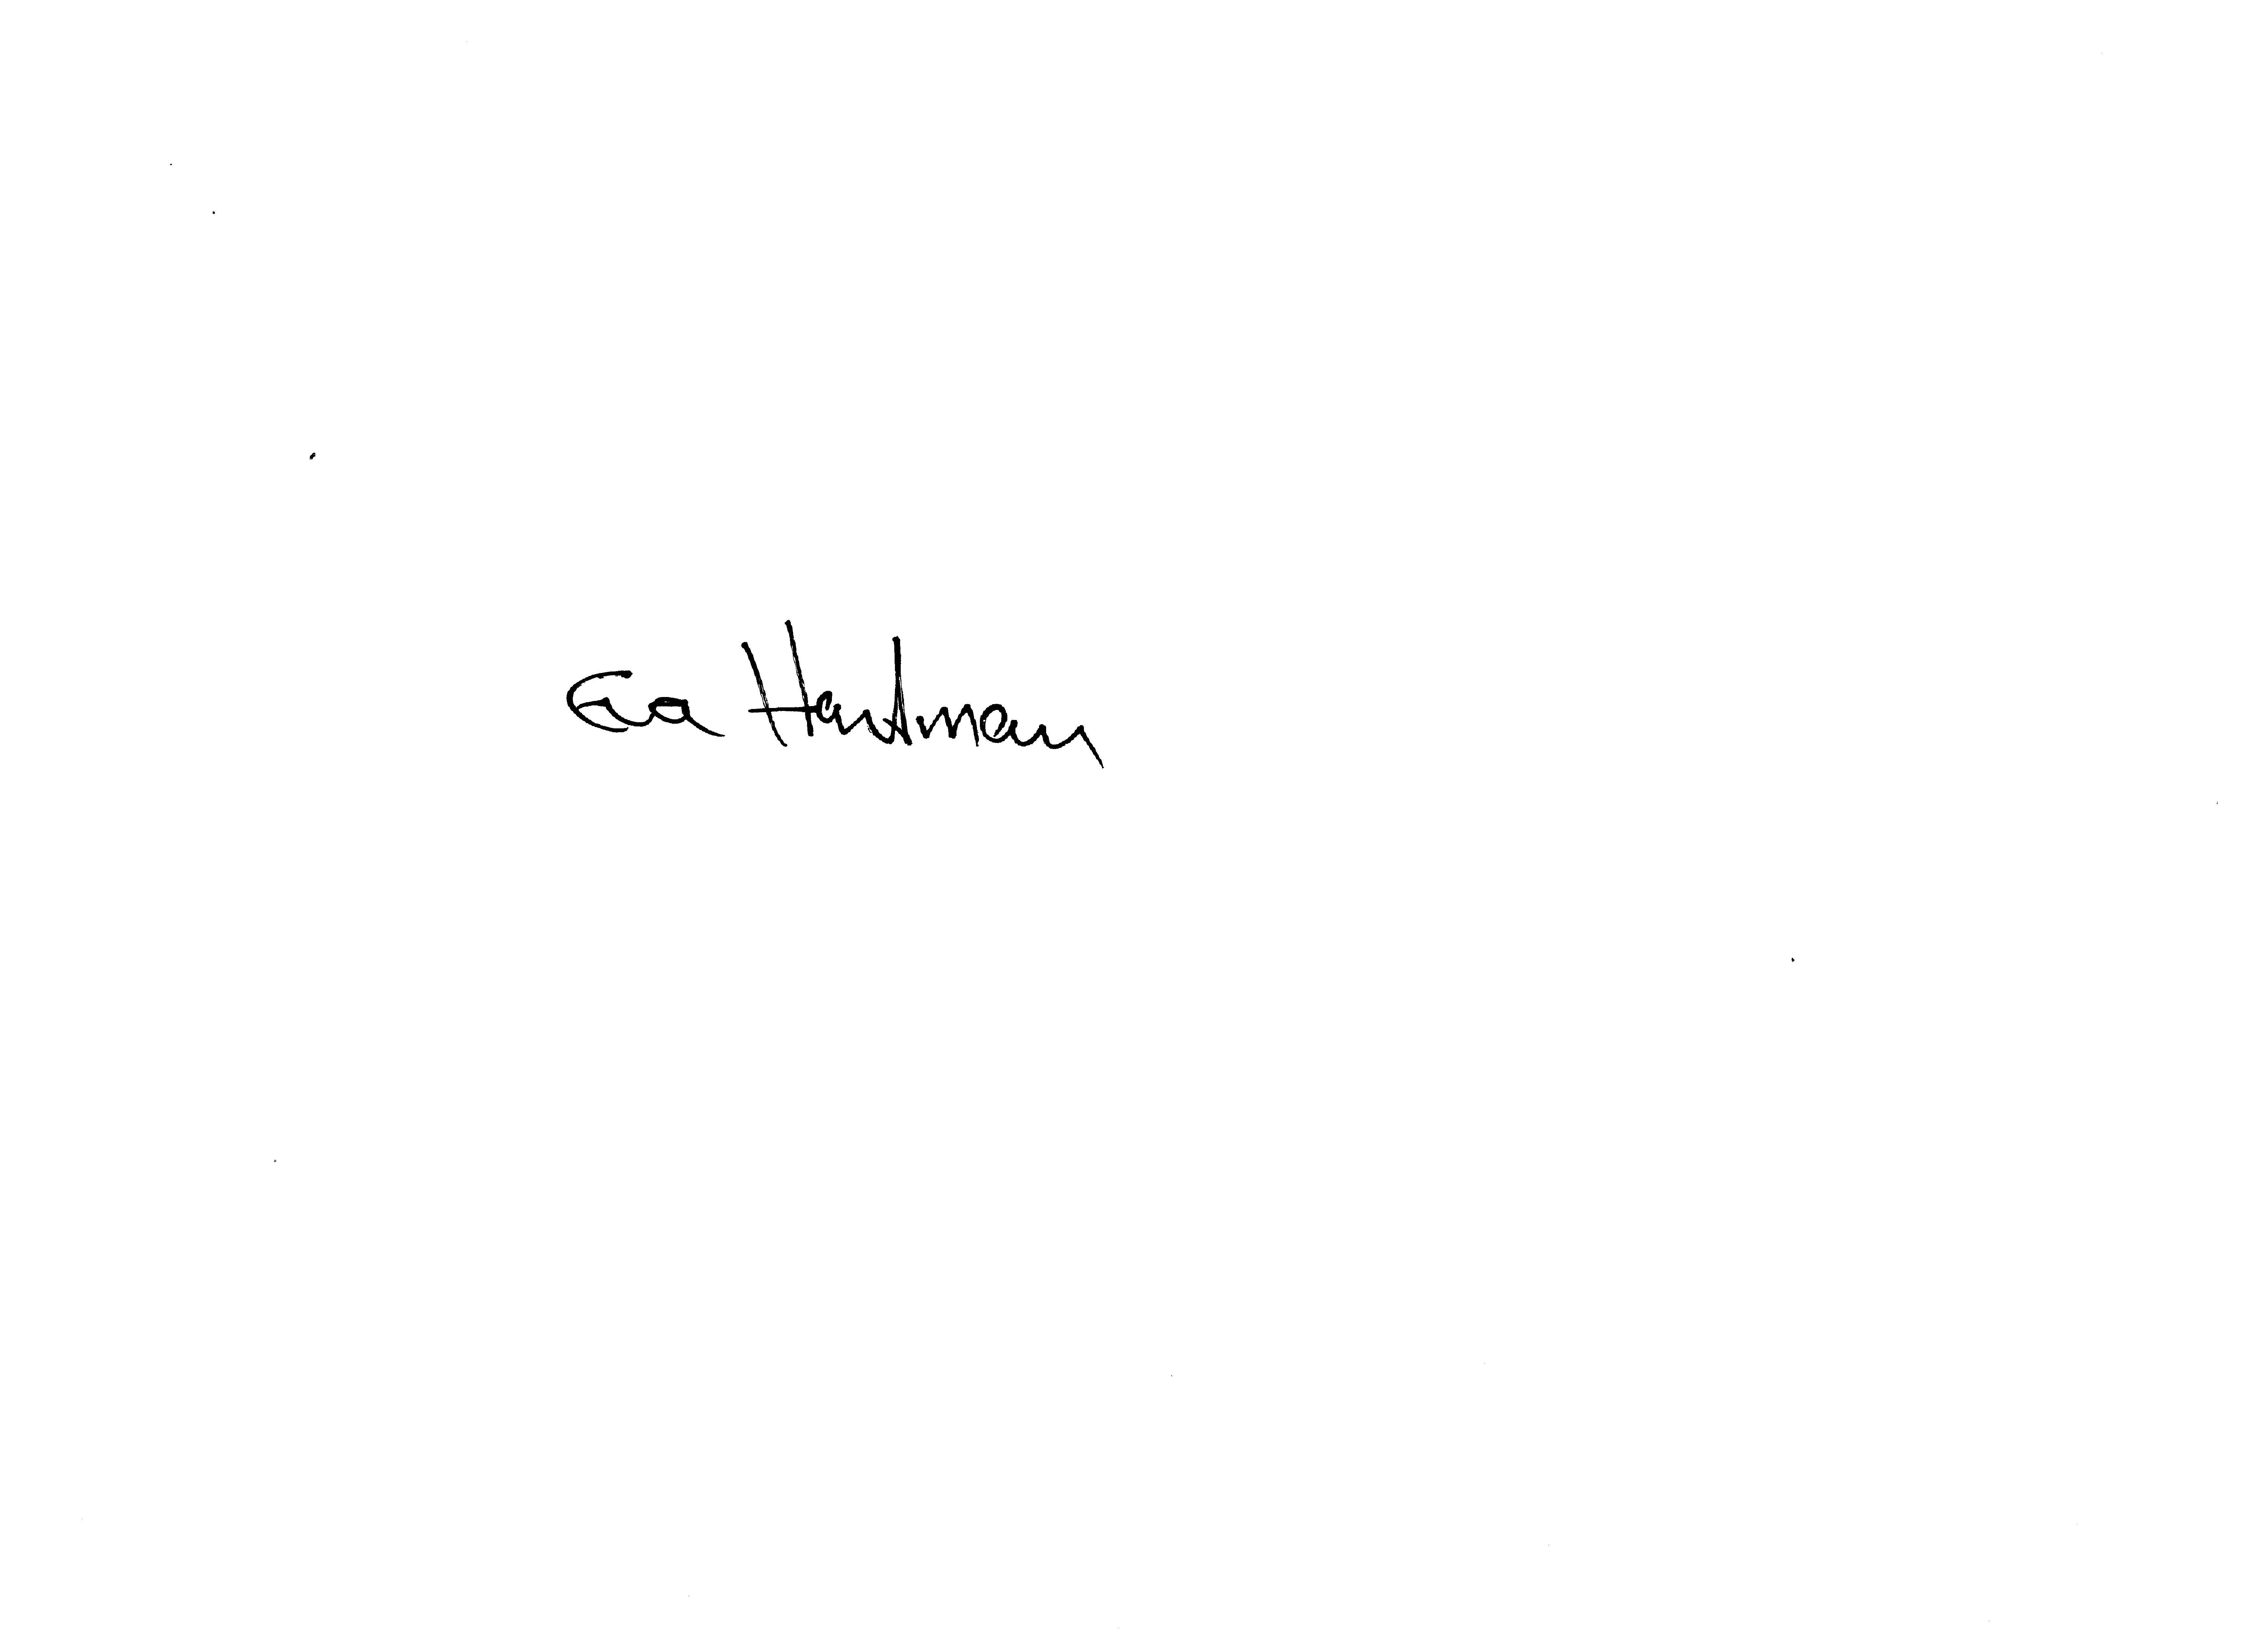 Eva Hartman Signature